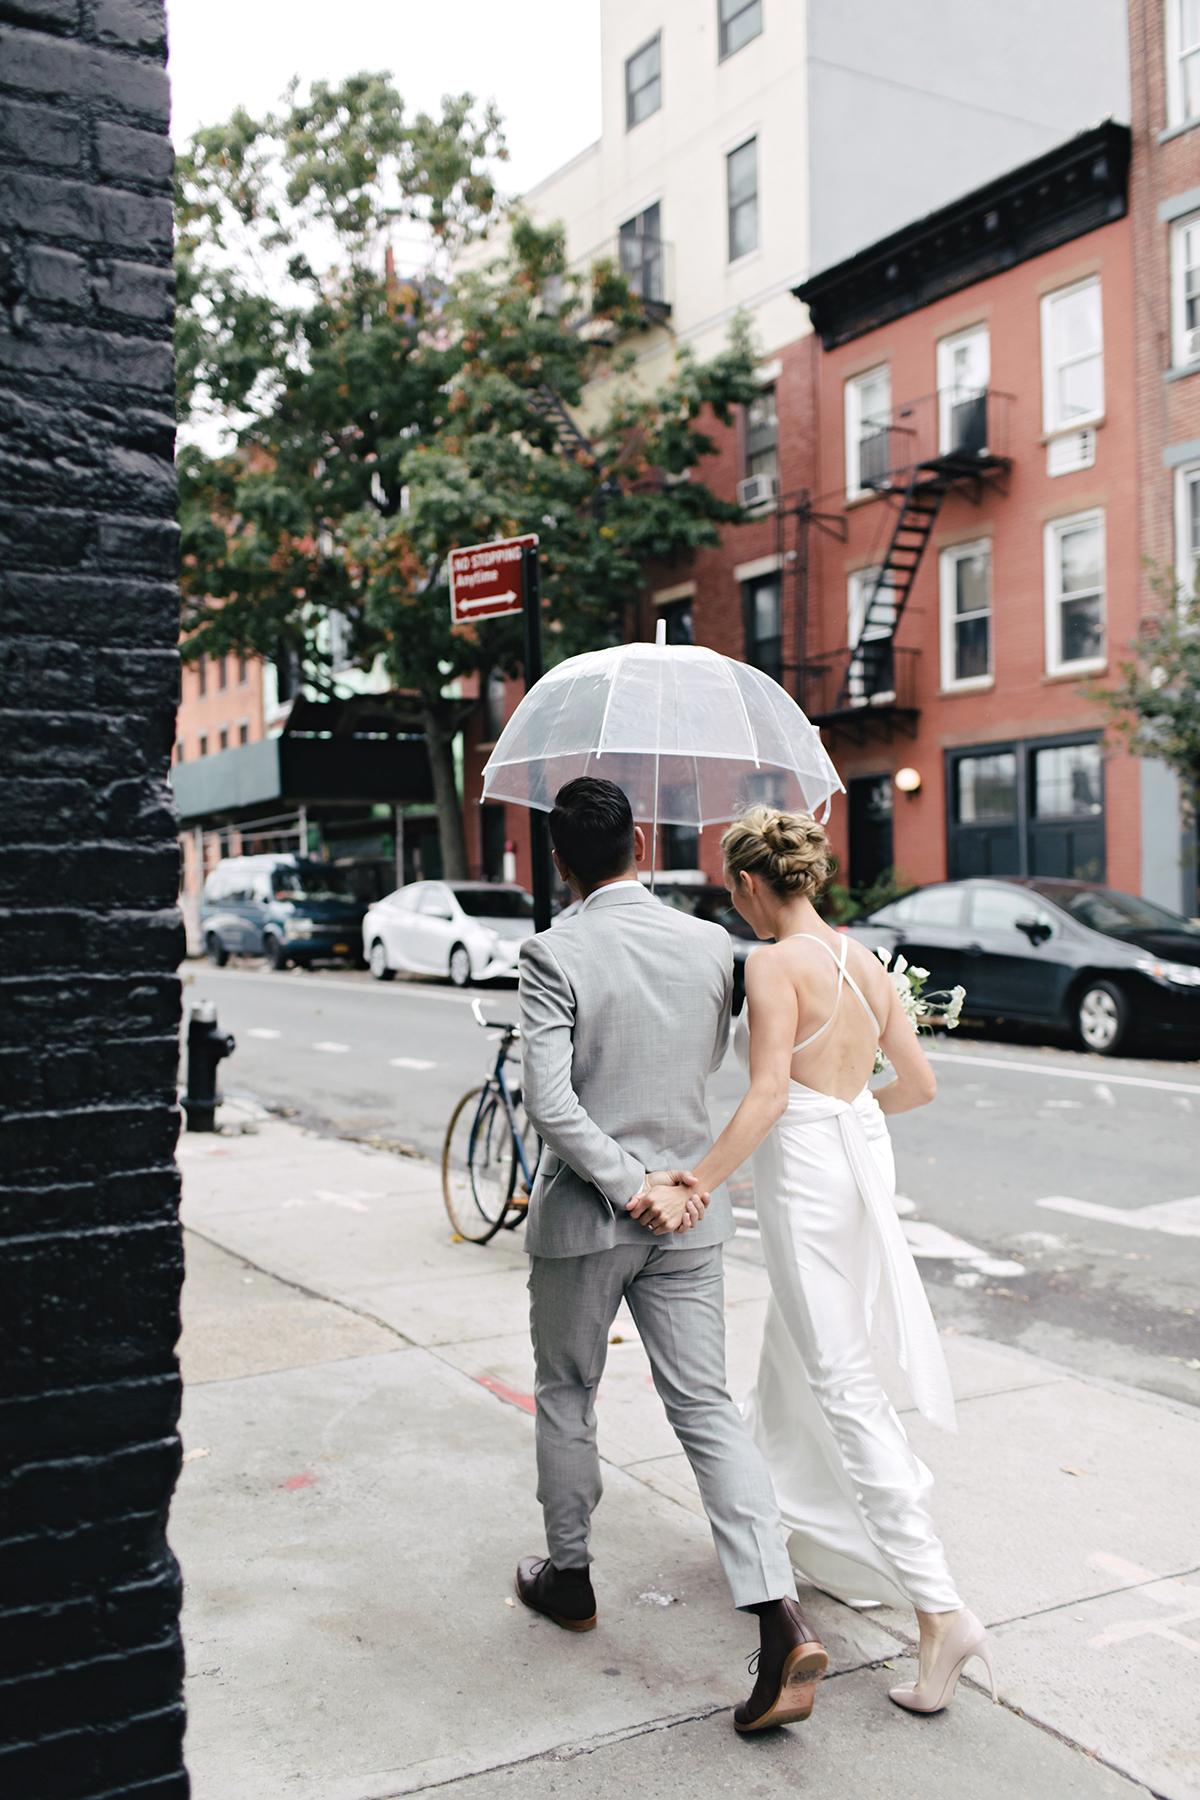 ana and damon walking with umbrella